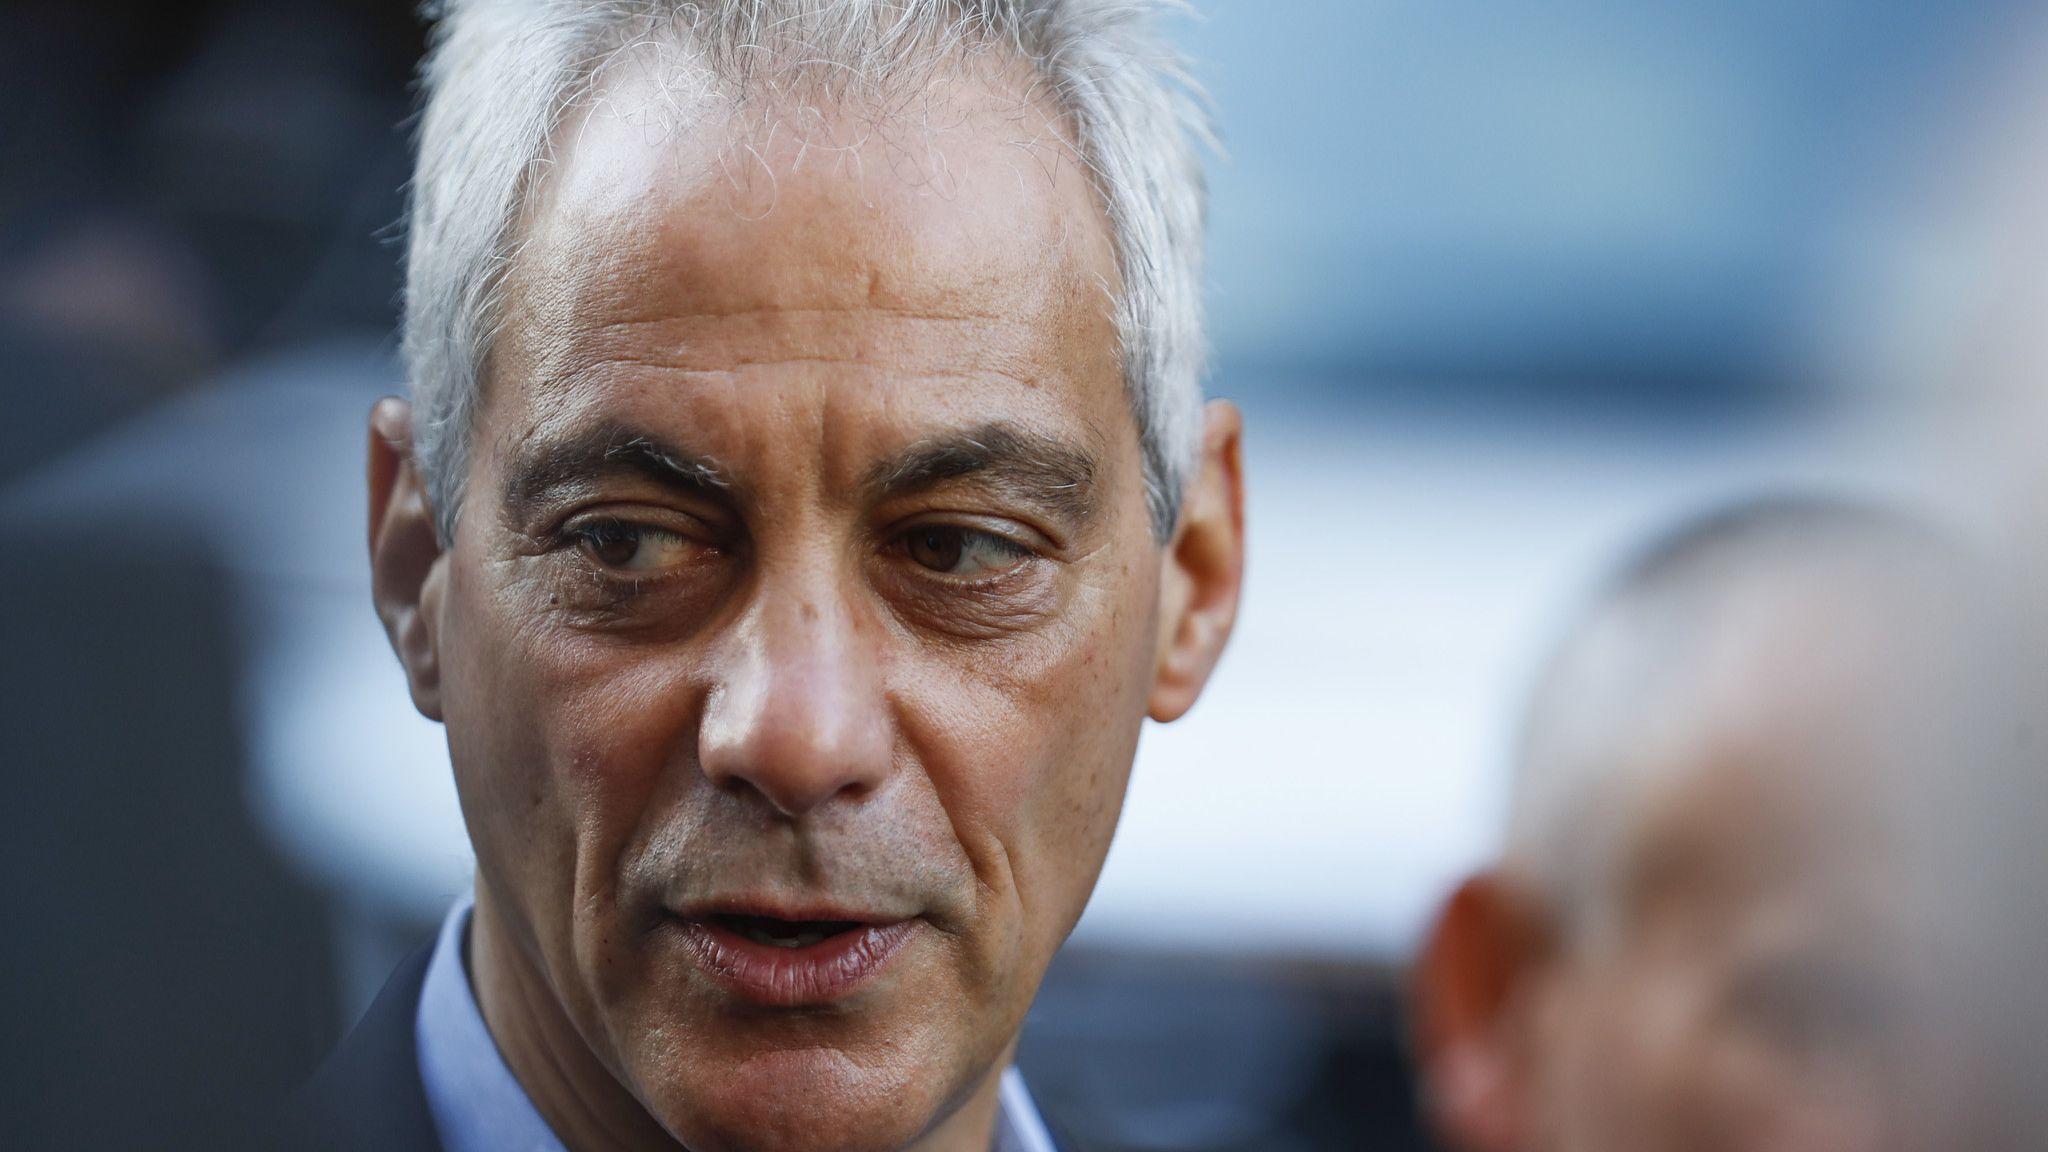 Chicago Mayor Rahm Emanuel aims to hike electronic cigarette taxes | Chicago Tribune